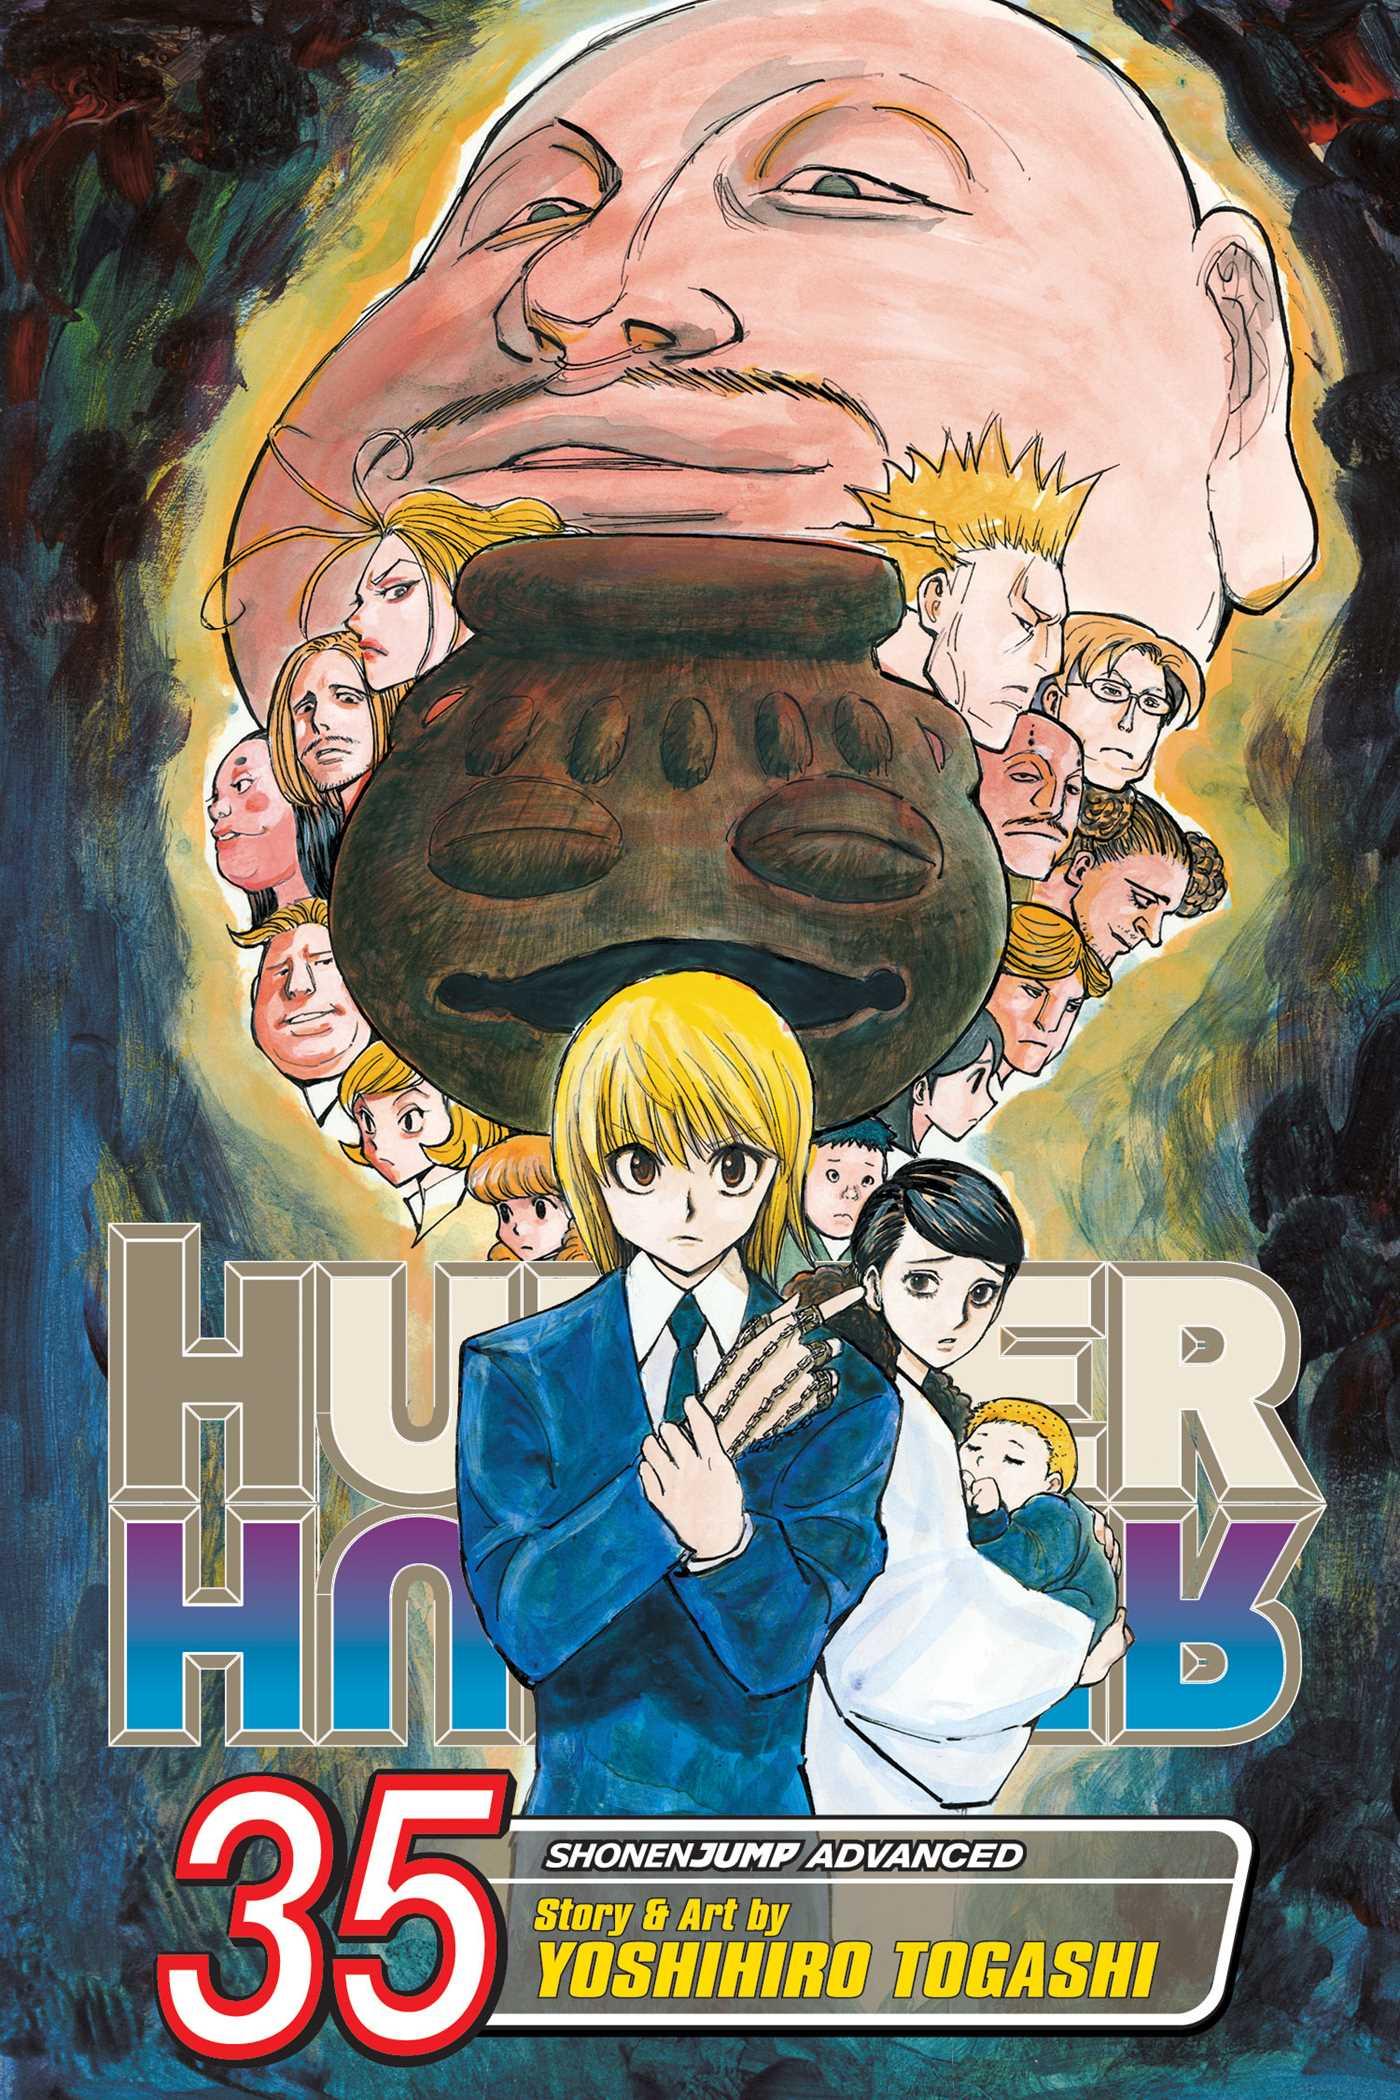 Hunter x Hunter, Vol. 35 | Book by Yoshihiro Togashi | Official ...